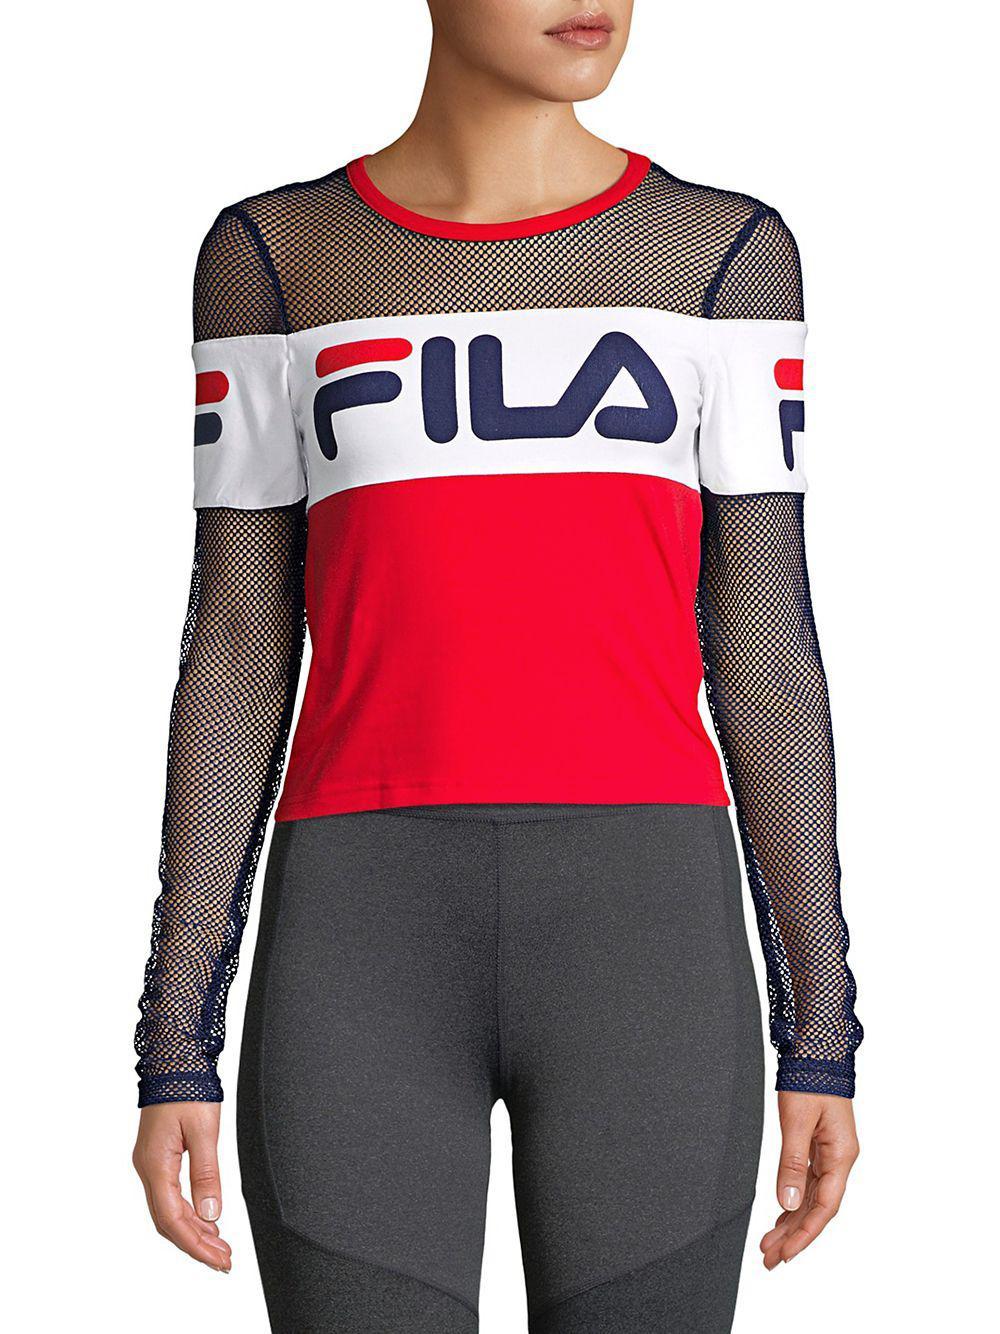 005f5a38d00 Fila - Red Tara Mesh-sleeve Cropped Top - Lyst. View fullscreen